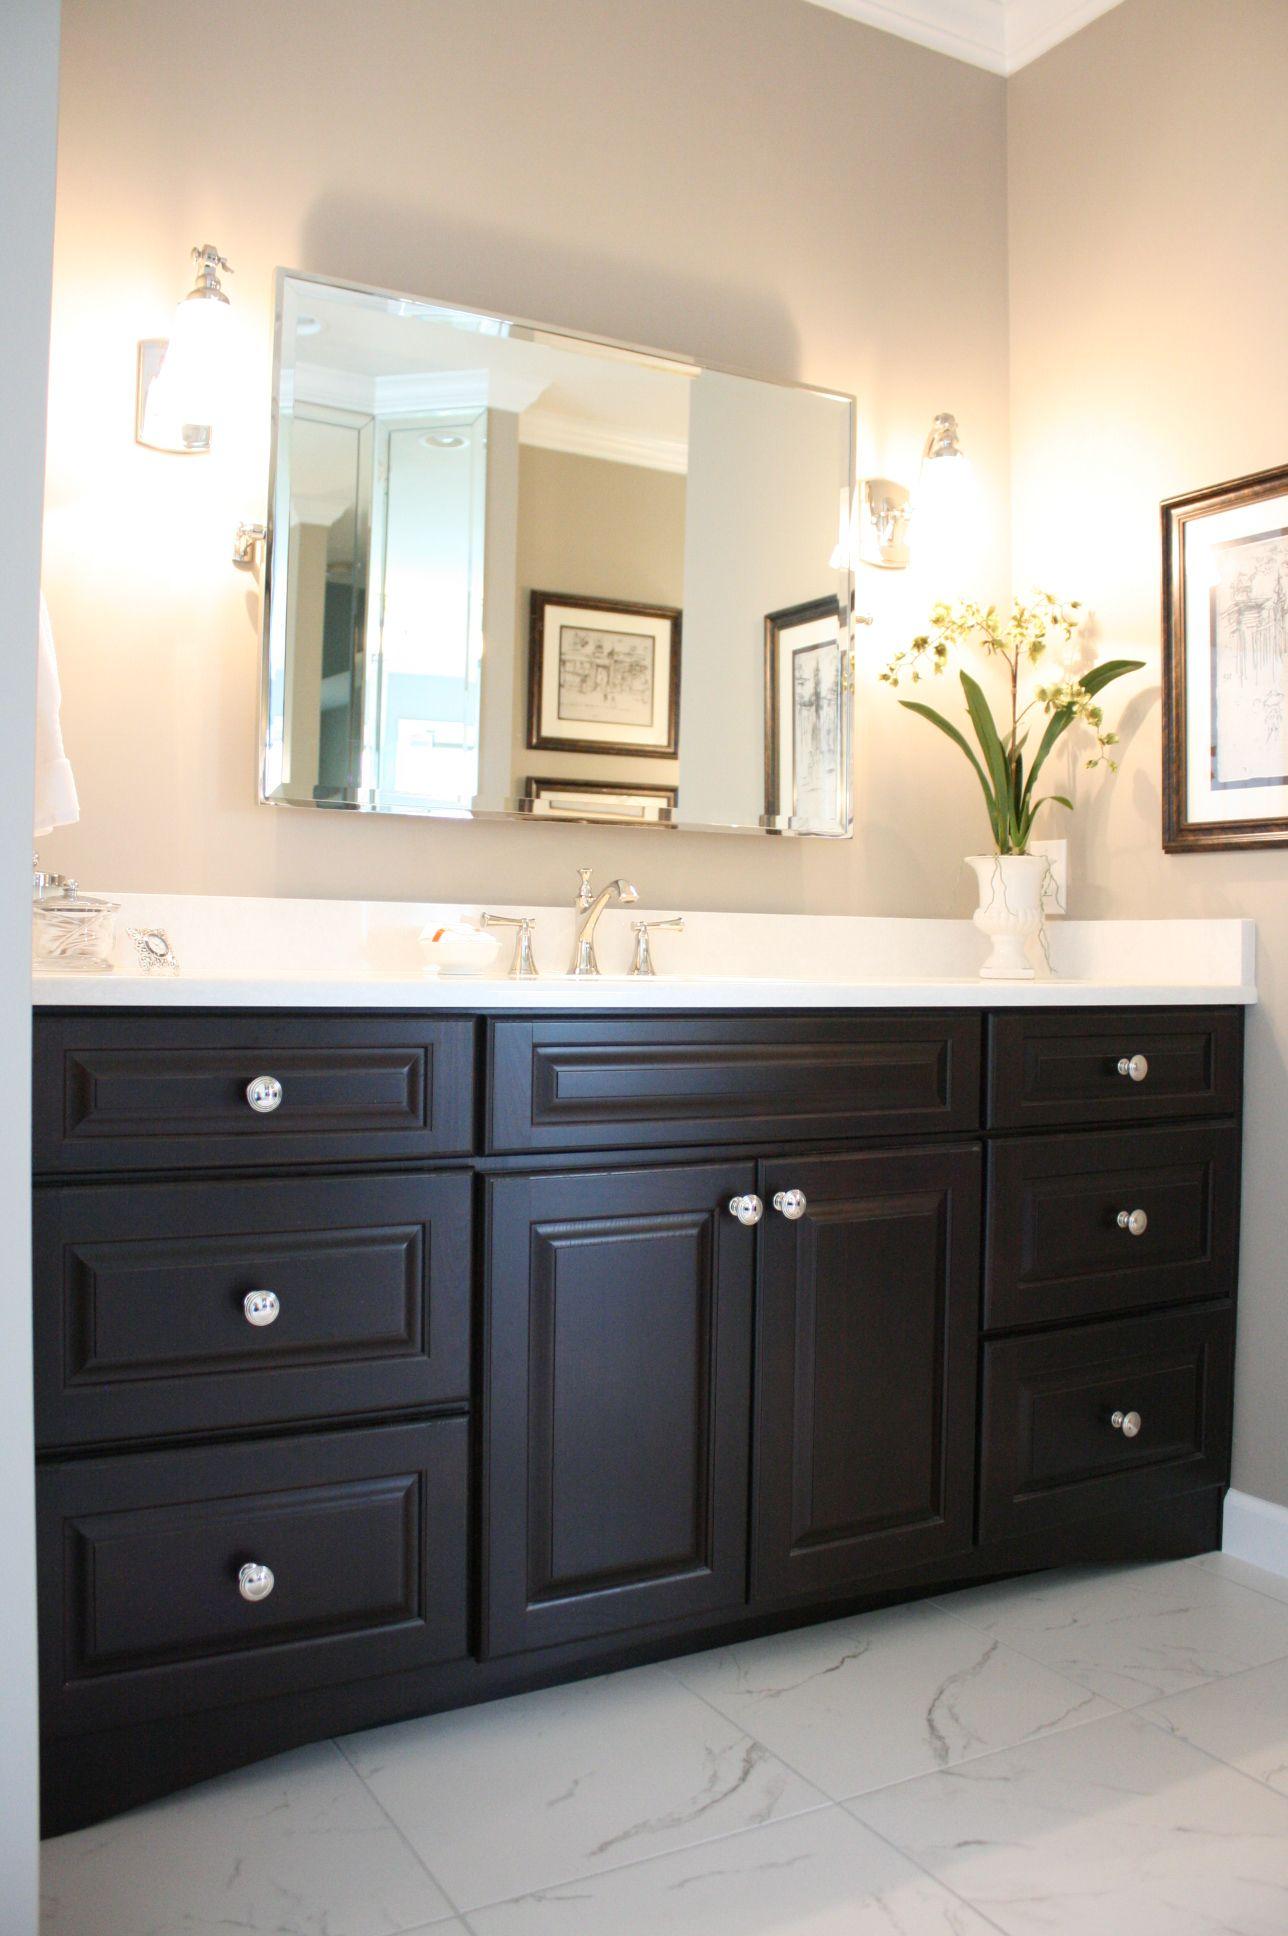 Koch Classic cabinetry Seneca raised panel door style Mocha